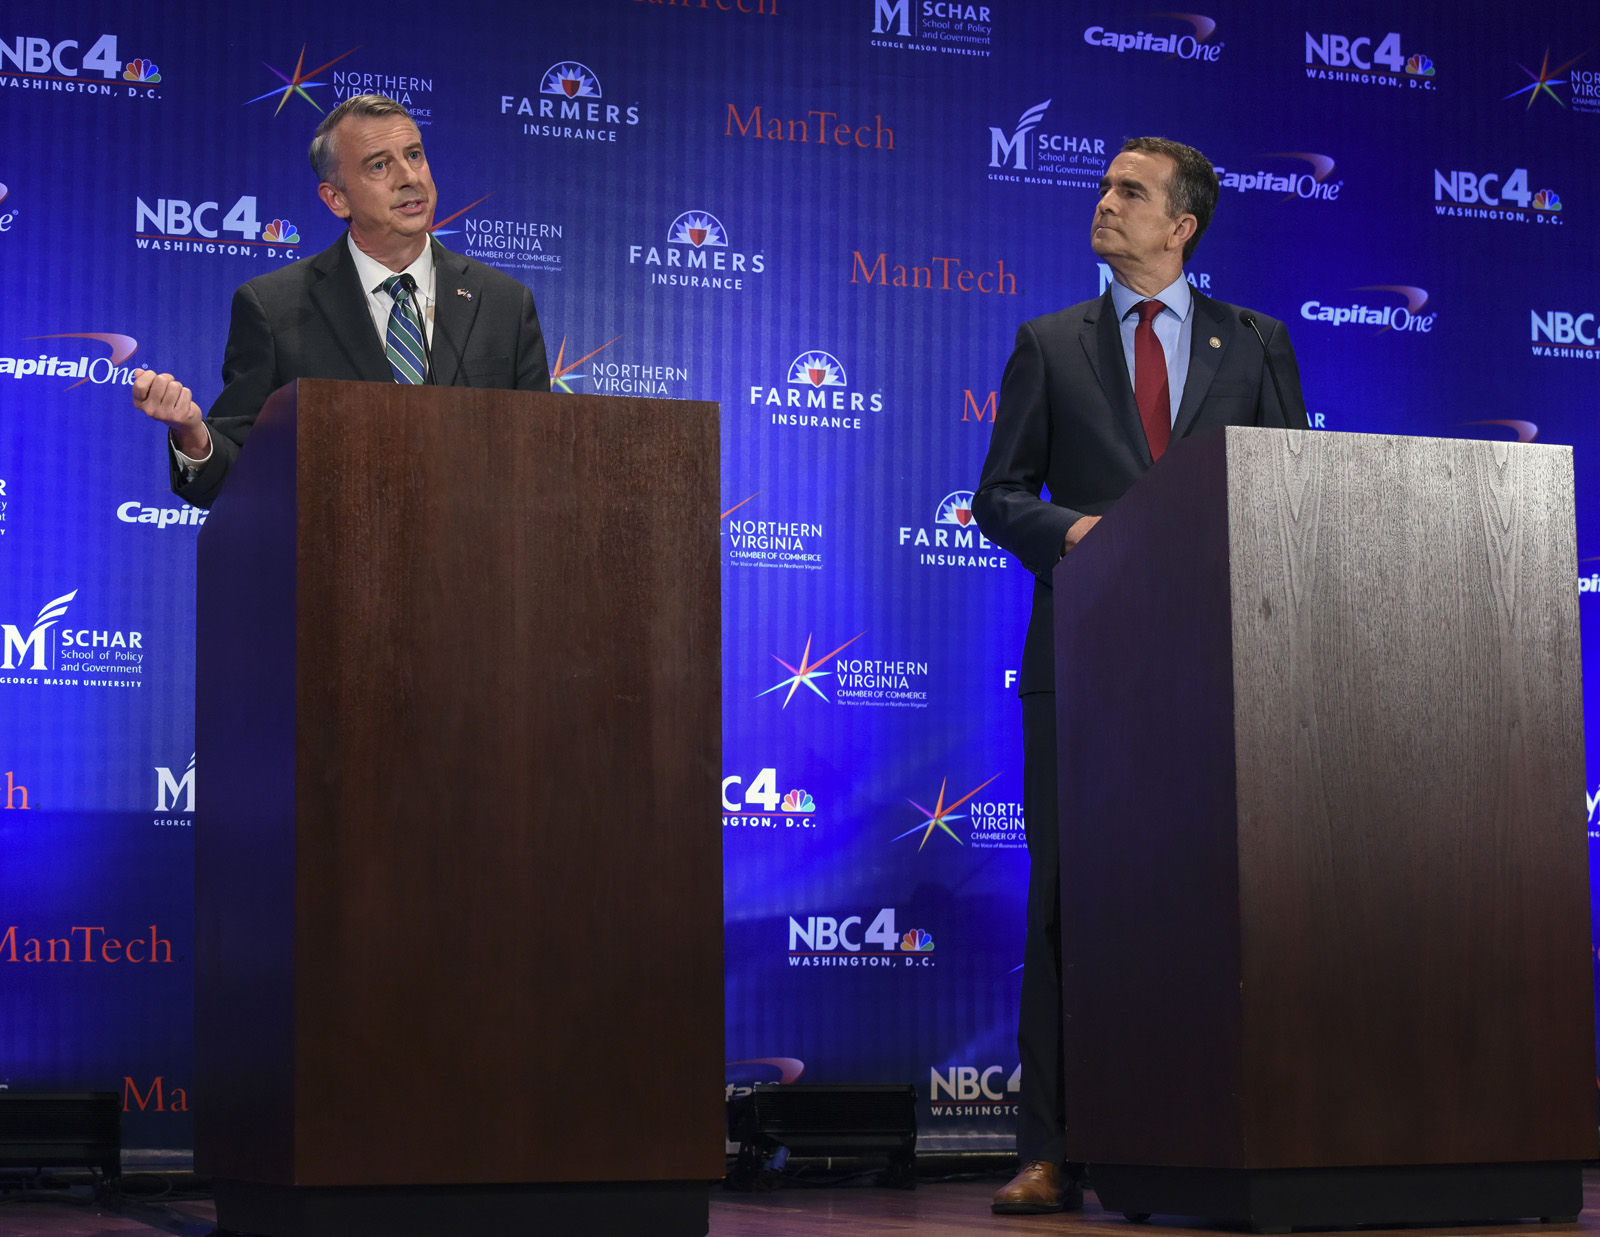 MCLEAN, VA - SEPTEMBER 19: Gubernatorial debate between Republican candidate Ed Gillespie, left, and Lt. Gov. Ralph Northam, Democrat, on September, 19, 2017 in McLean, VA. (Pool Photo by Bill O'Leary/The Washington Post)